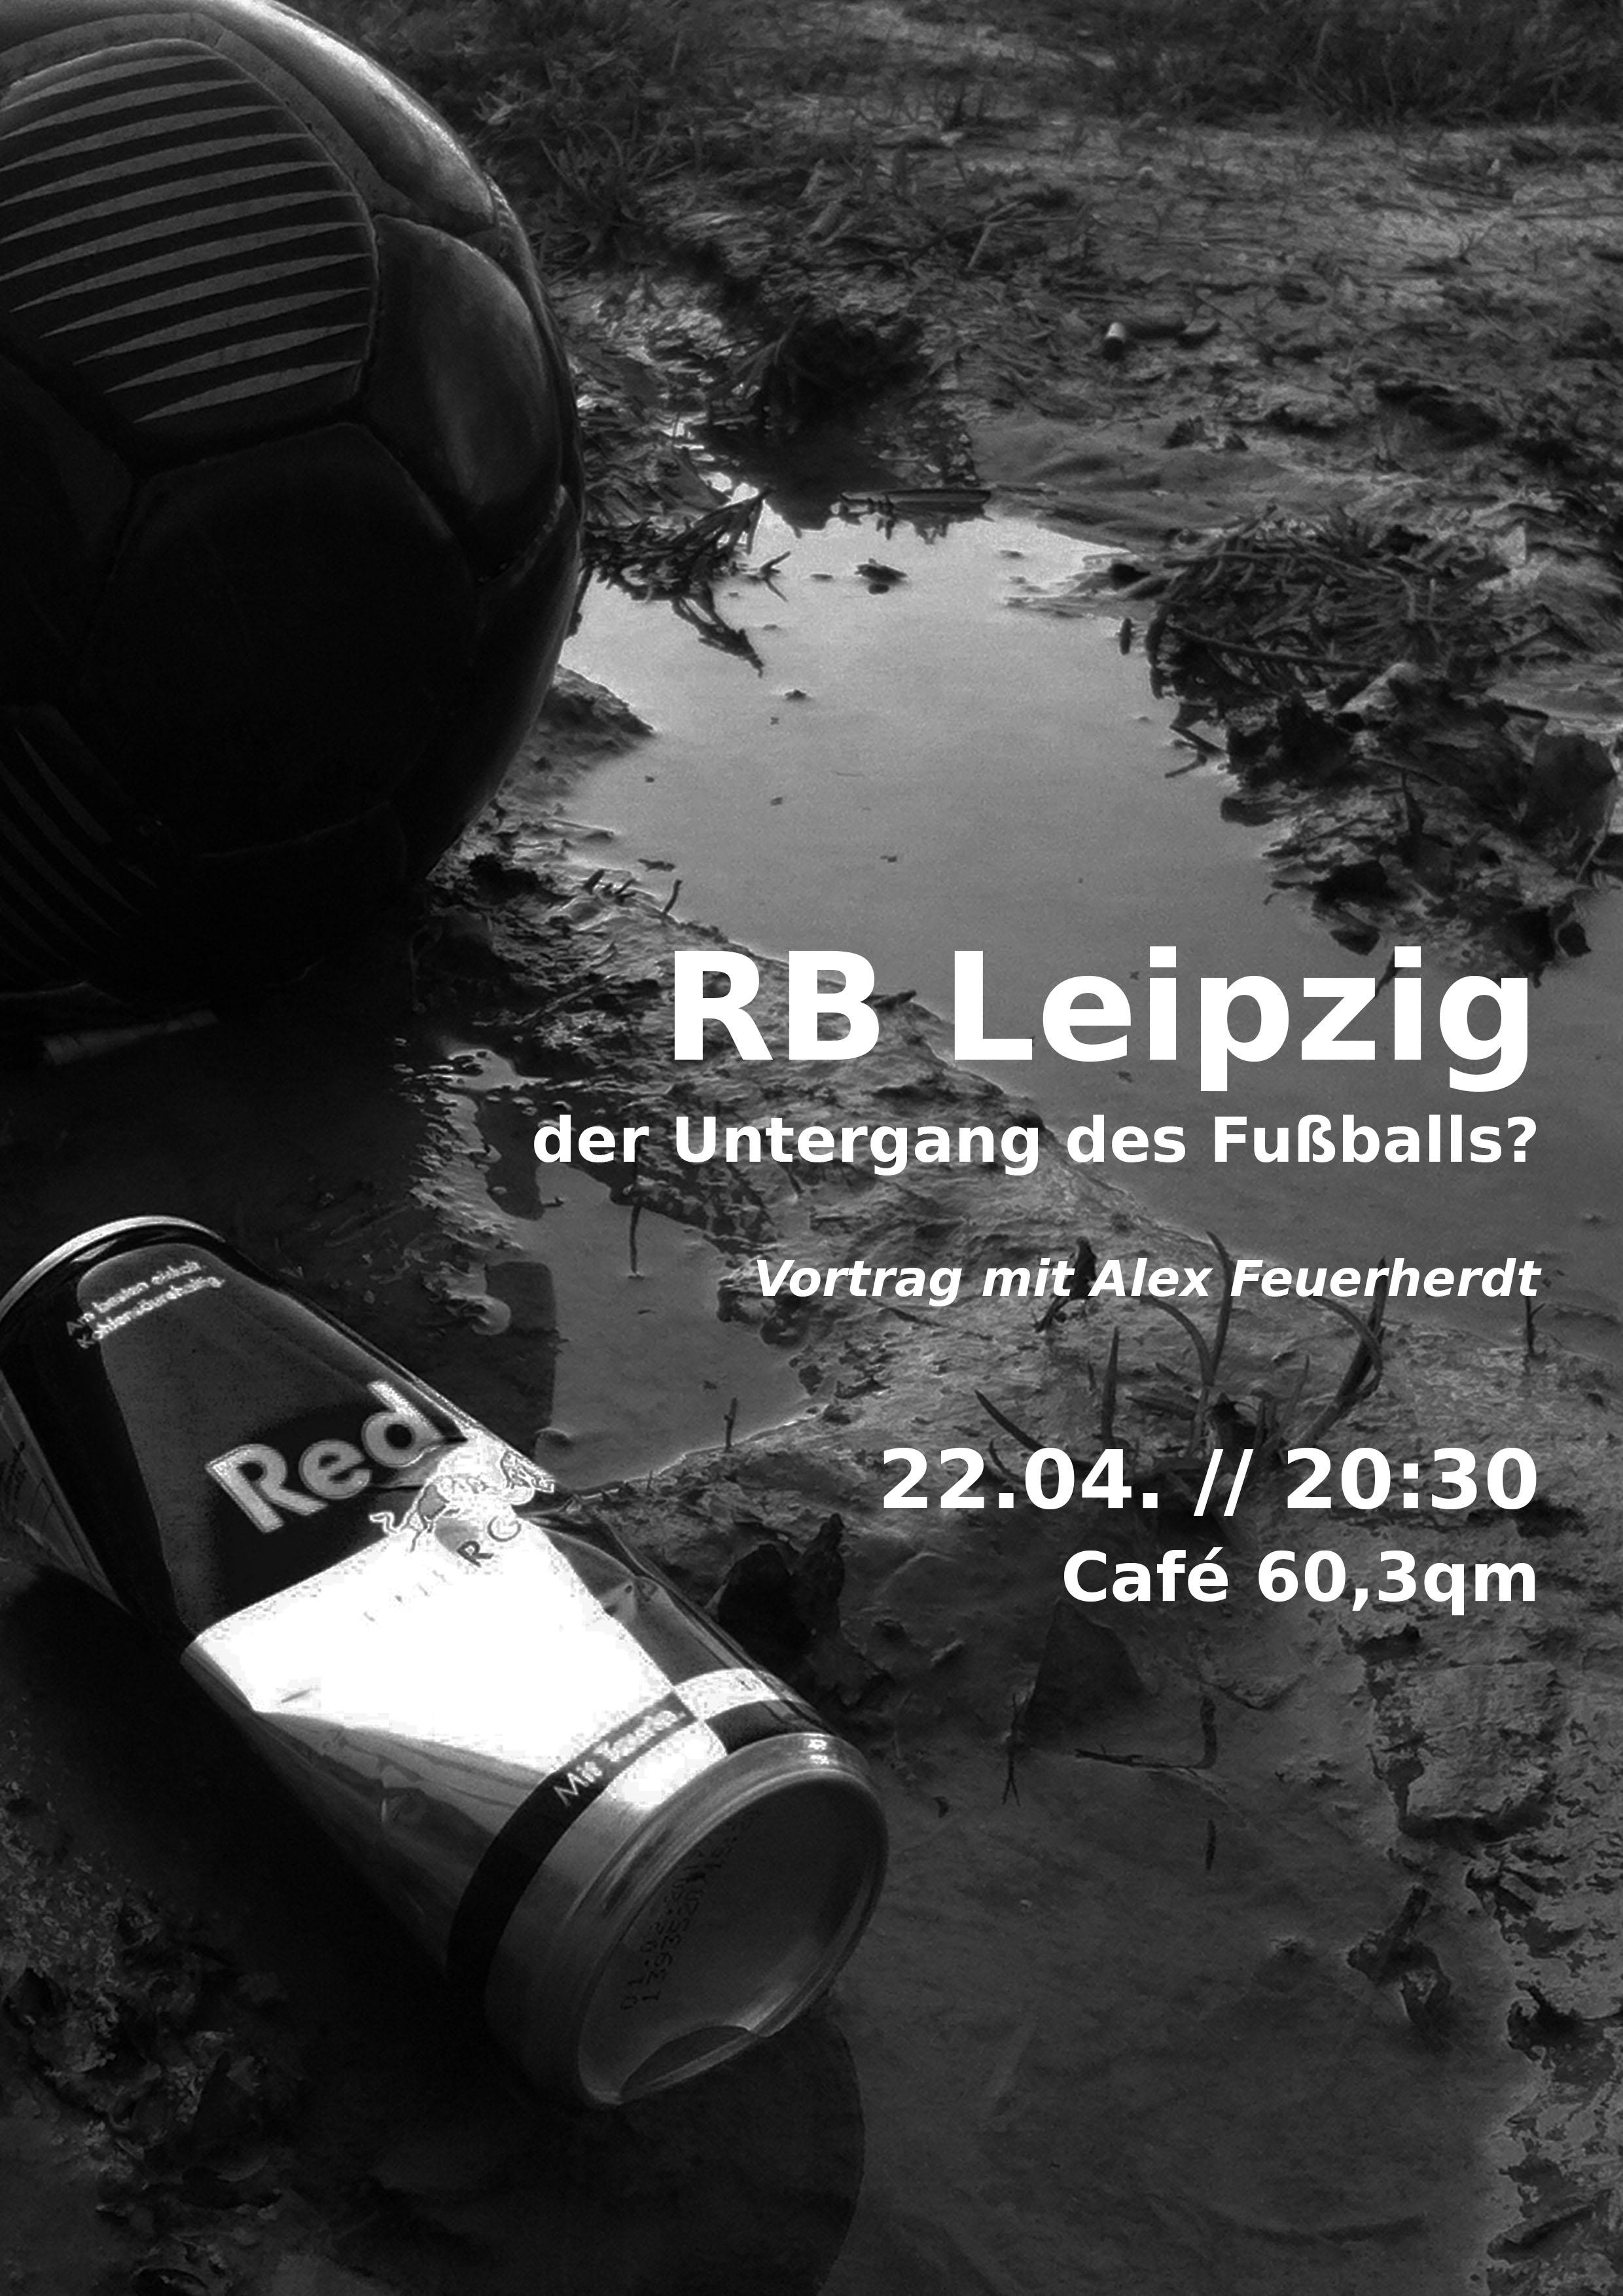 RB Leipzig Vortrag 2015